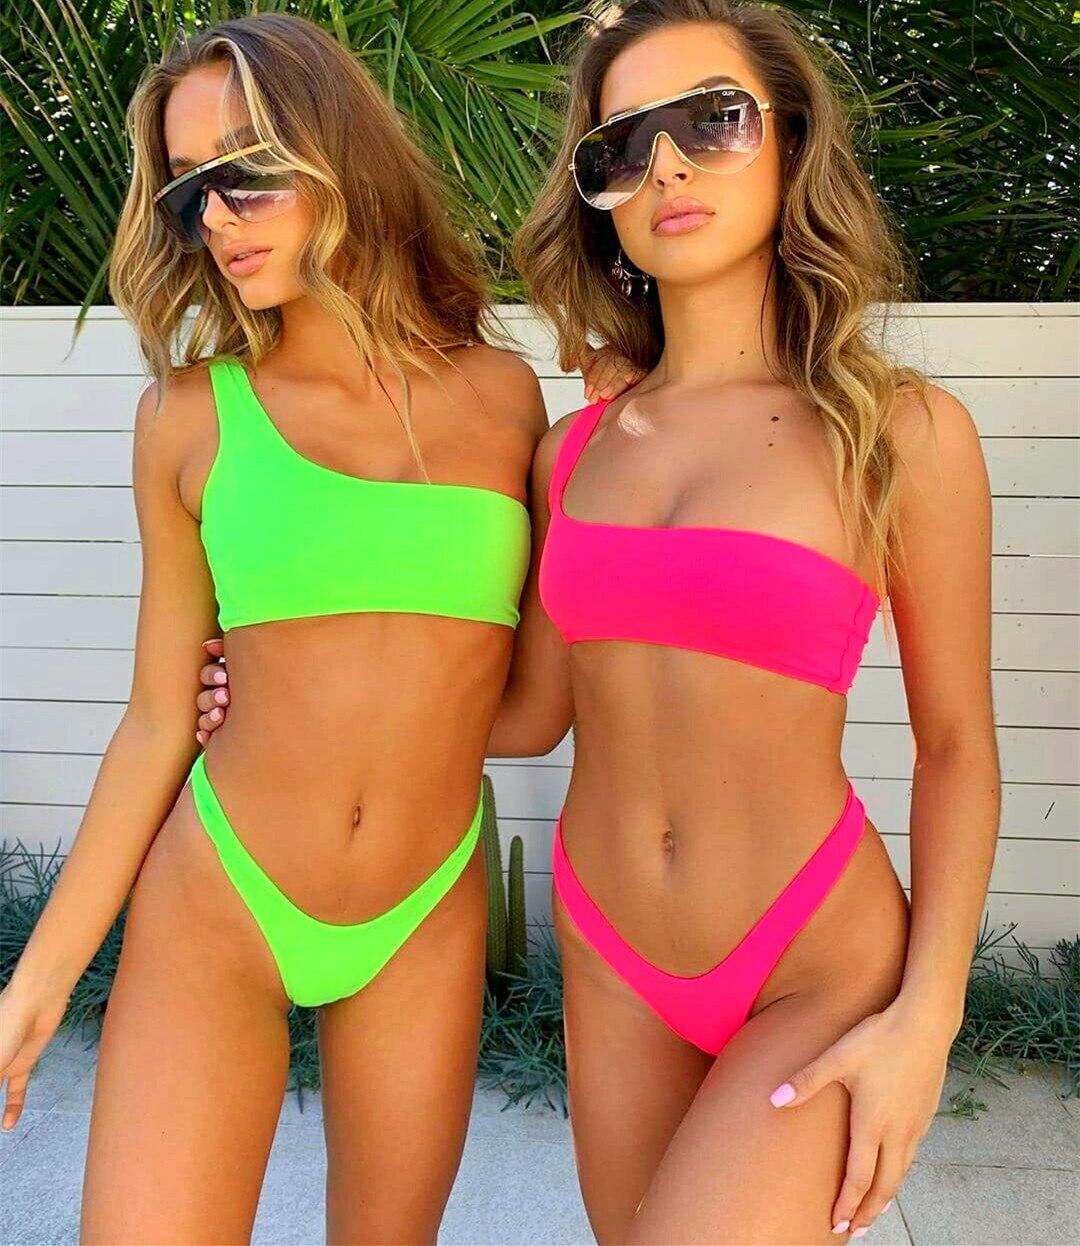 Sexy One Shoulder Thong Bikini Neon Green High Cut Swimsuit Female Bathing Suit Swimwear Women Biquini Push Up Bathers